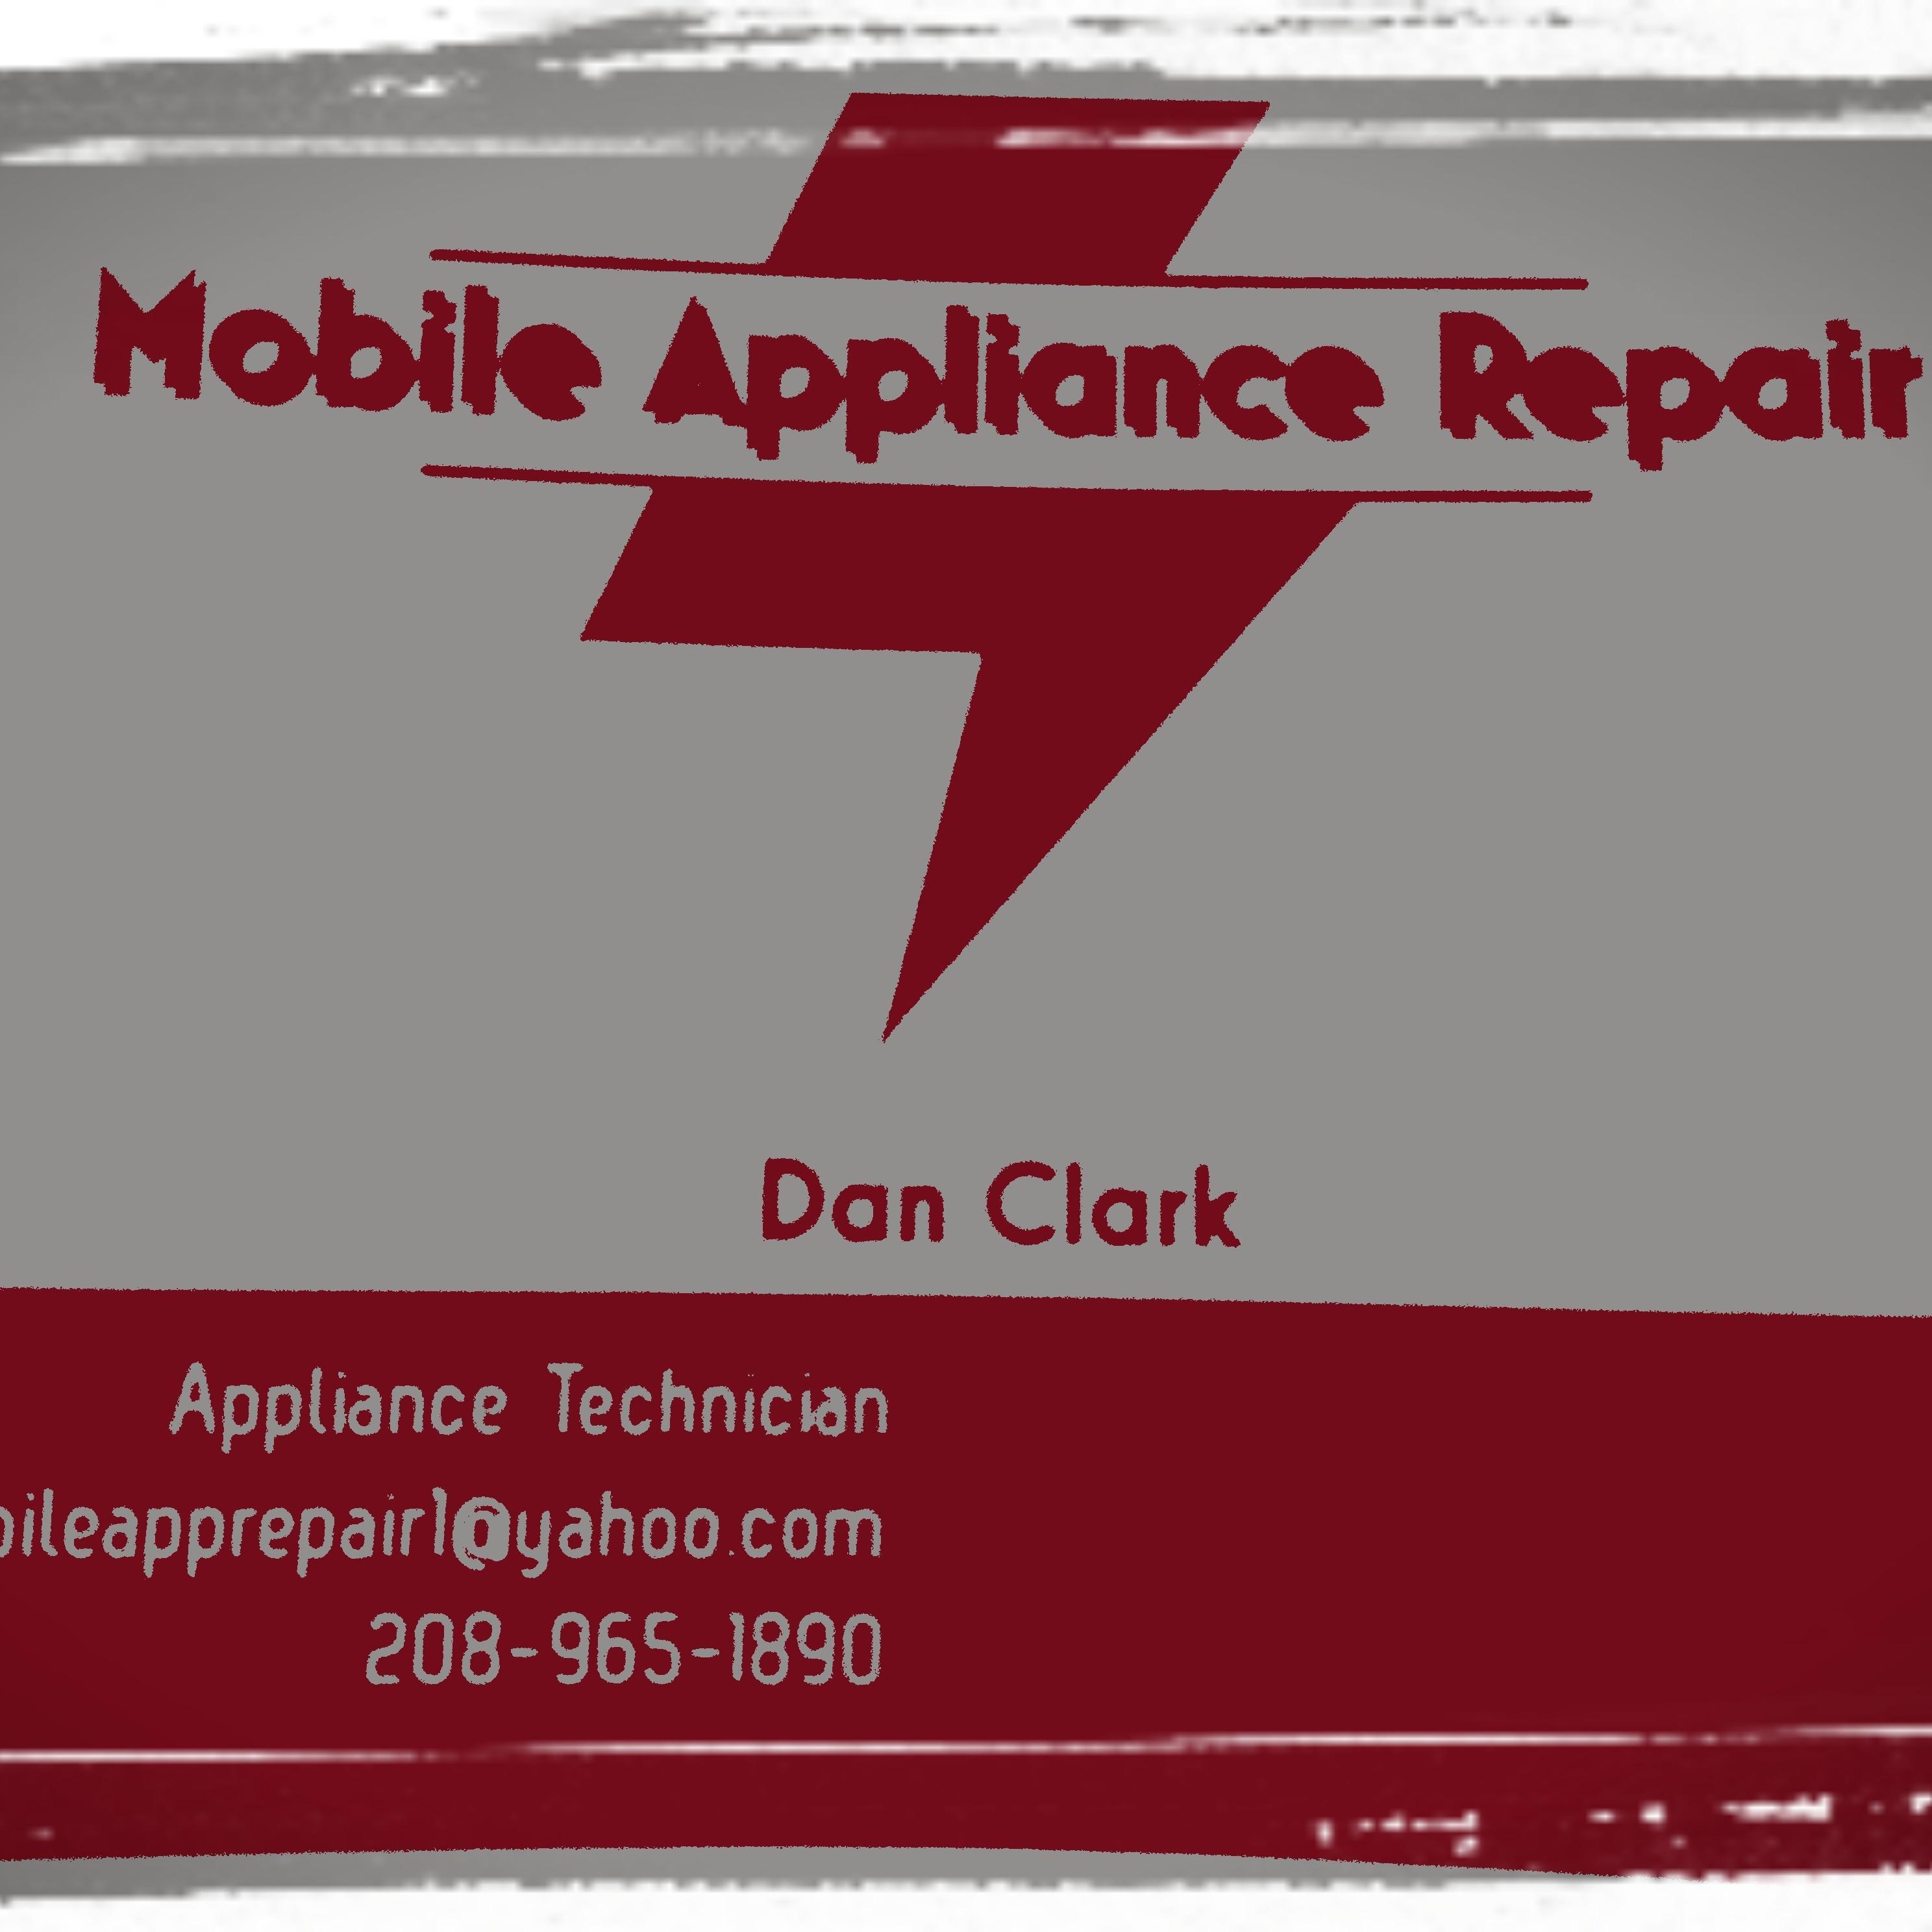 Mobile Appliance Repair